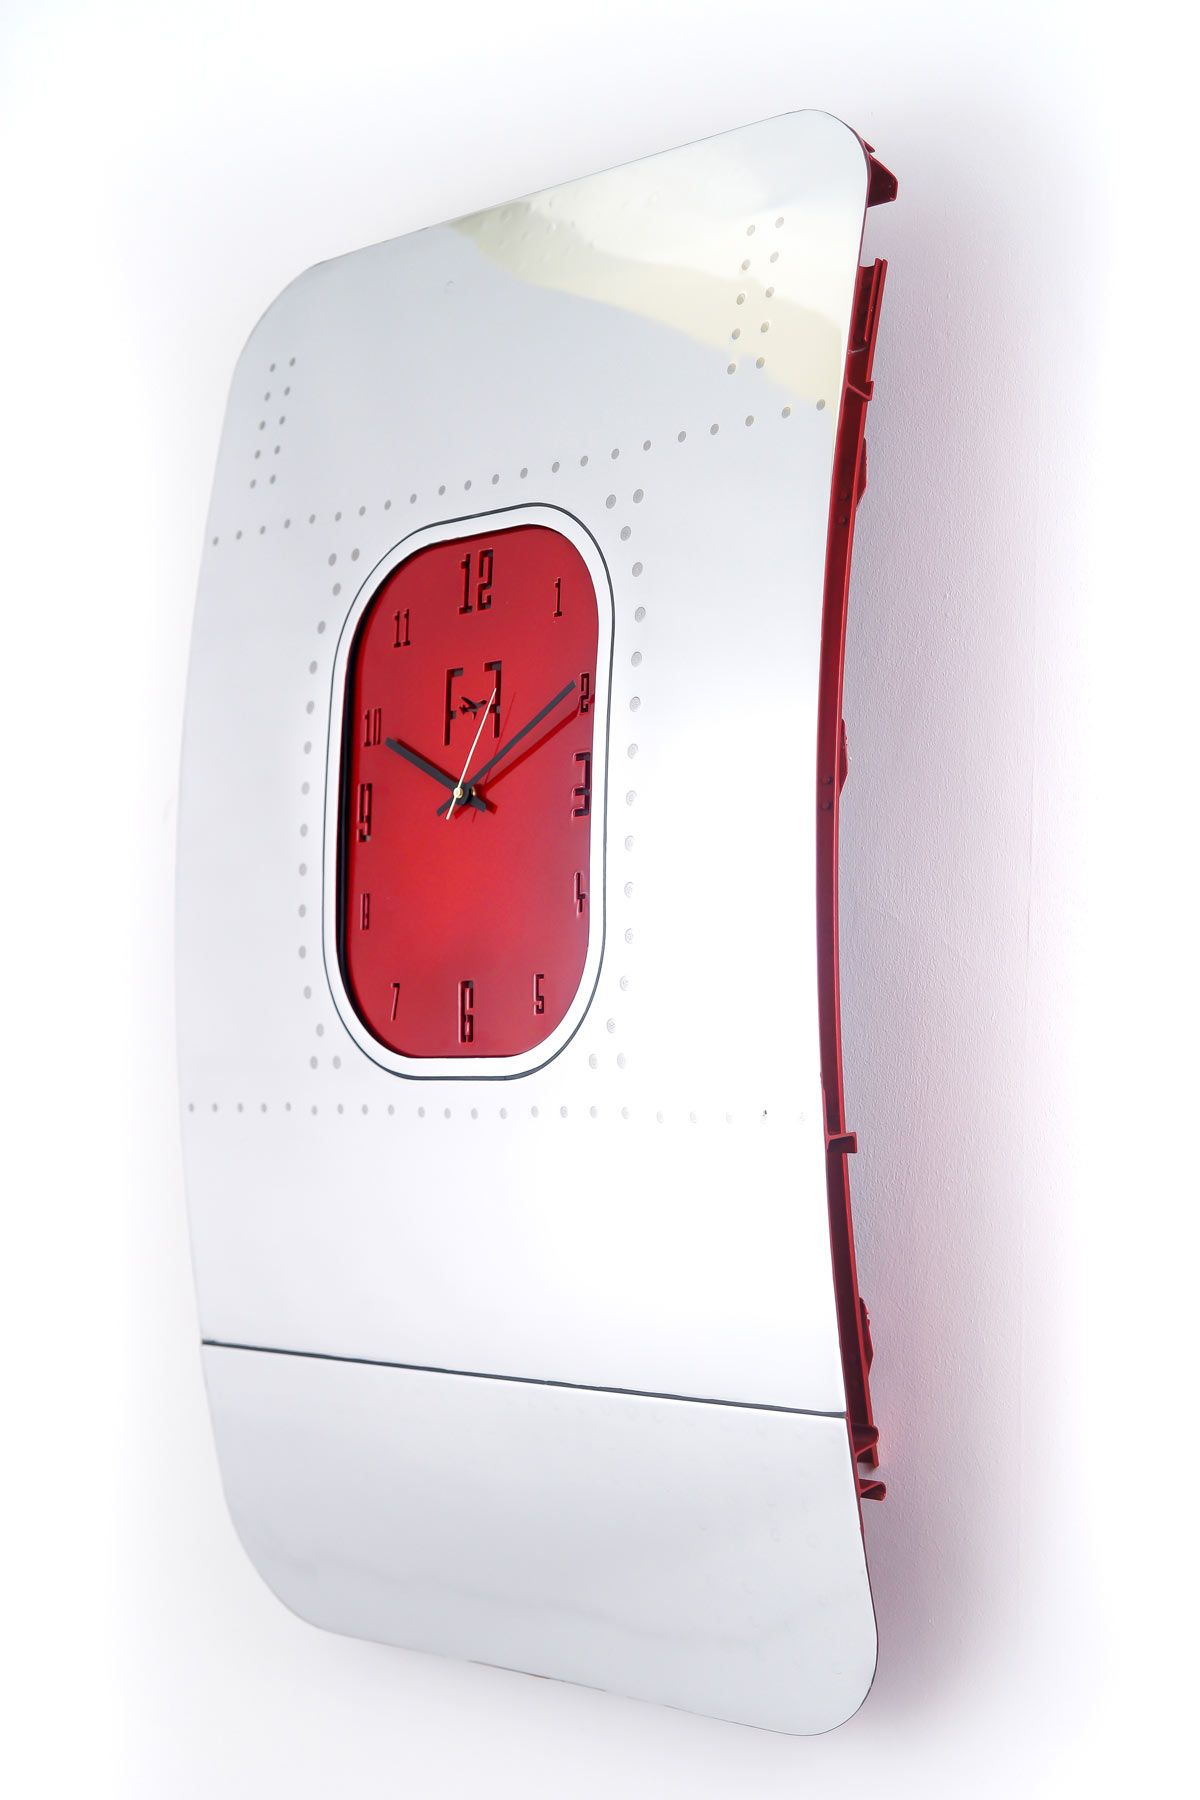 Wall Art Luxury Furniture Airplane Aircraft Boeing Clock Time Piece Aviation Furniture Luxury Furniture Airplane Decor